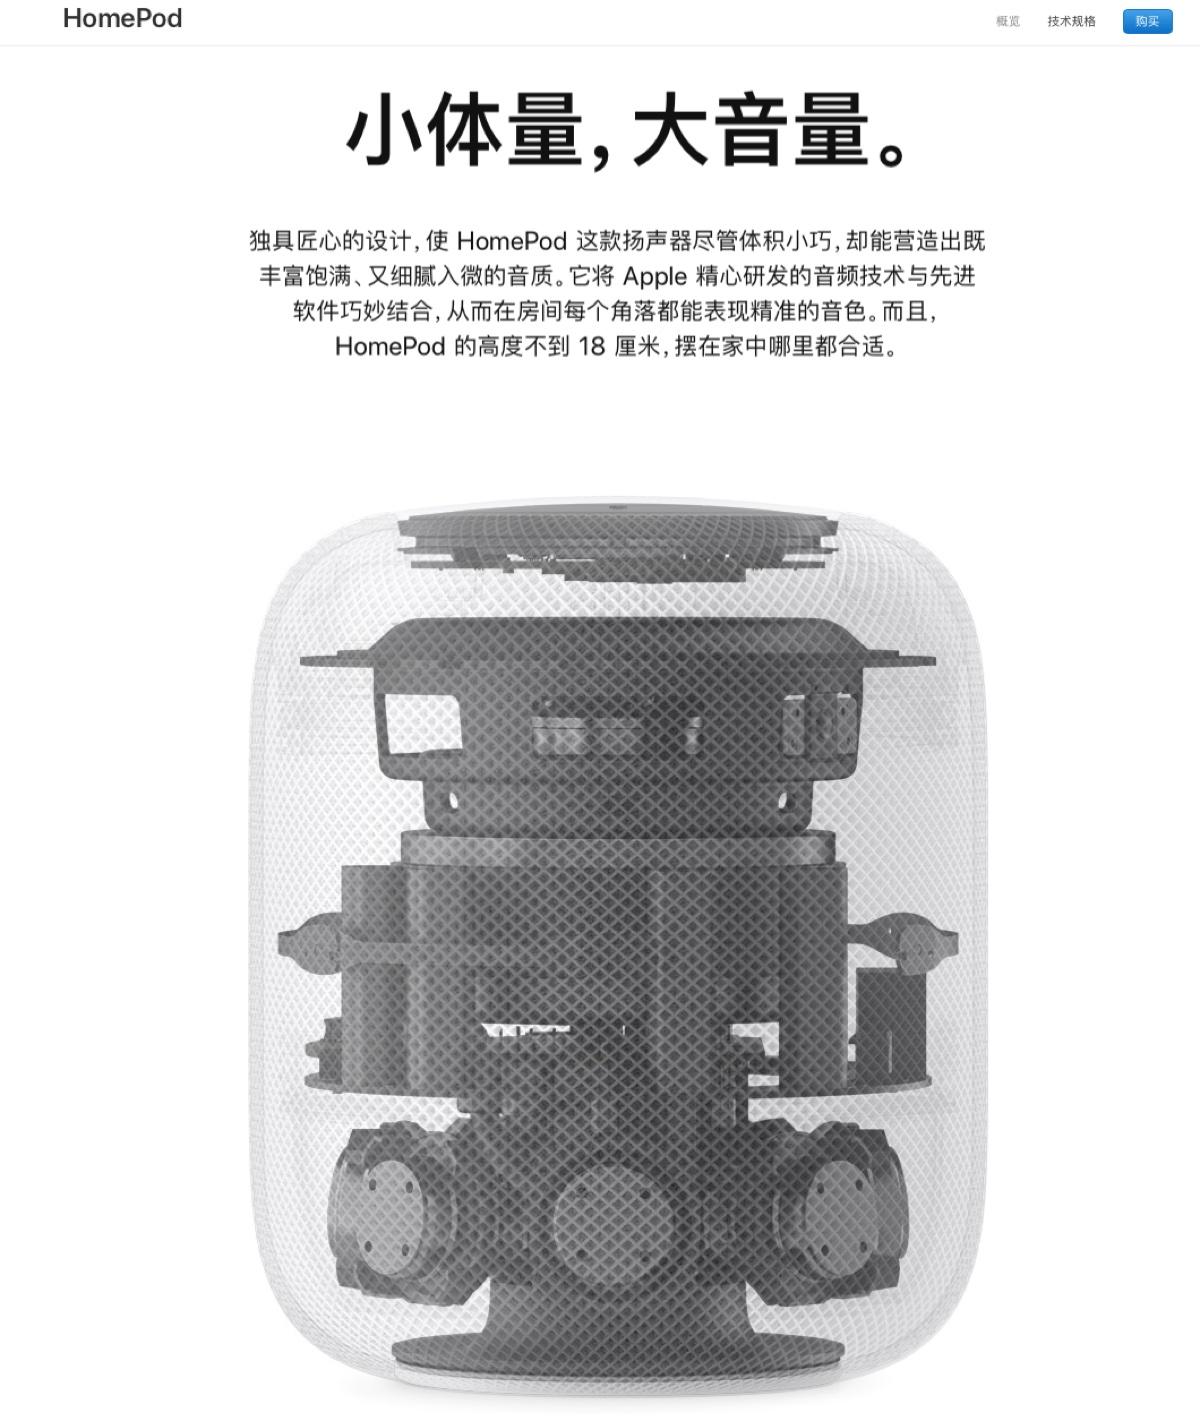 Apple HomePod ora è disponibile in Cina e Hong Kong